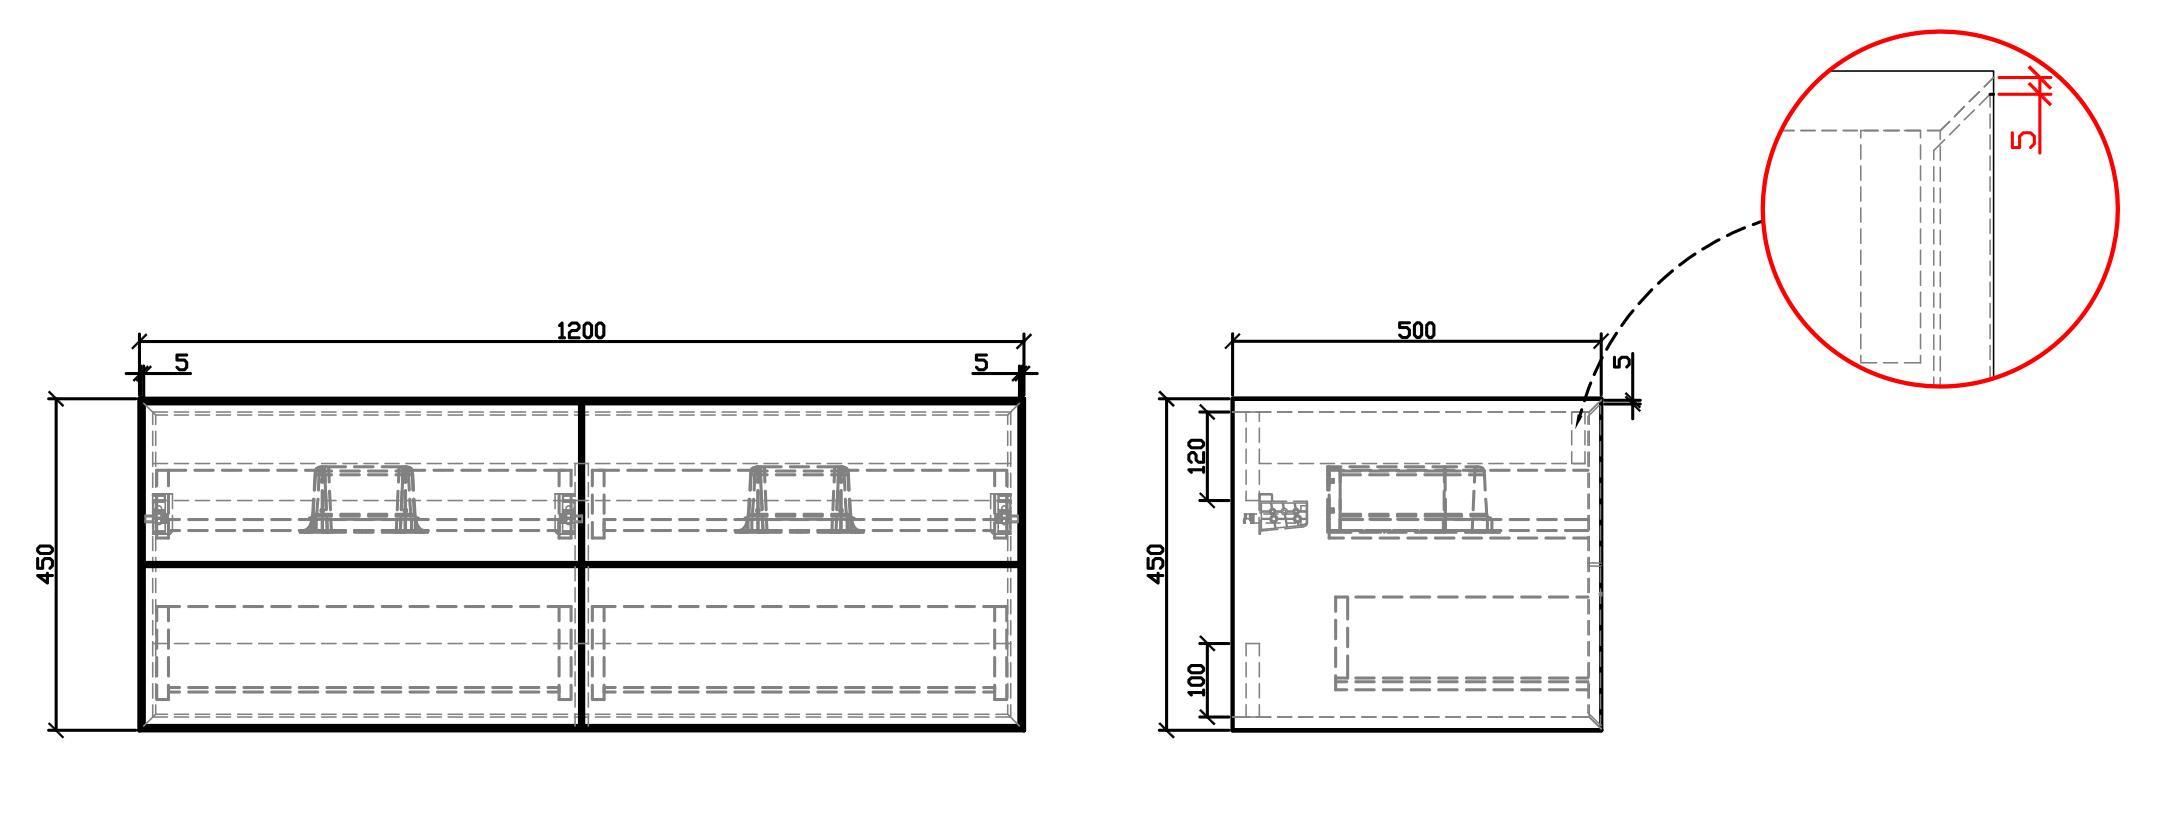 Bathroom furniture set Milou 1200 - Drawing 1